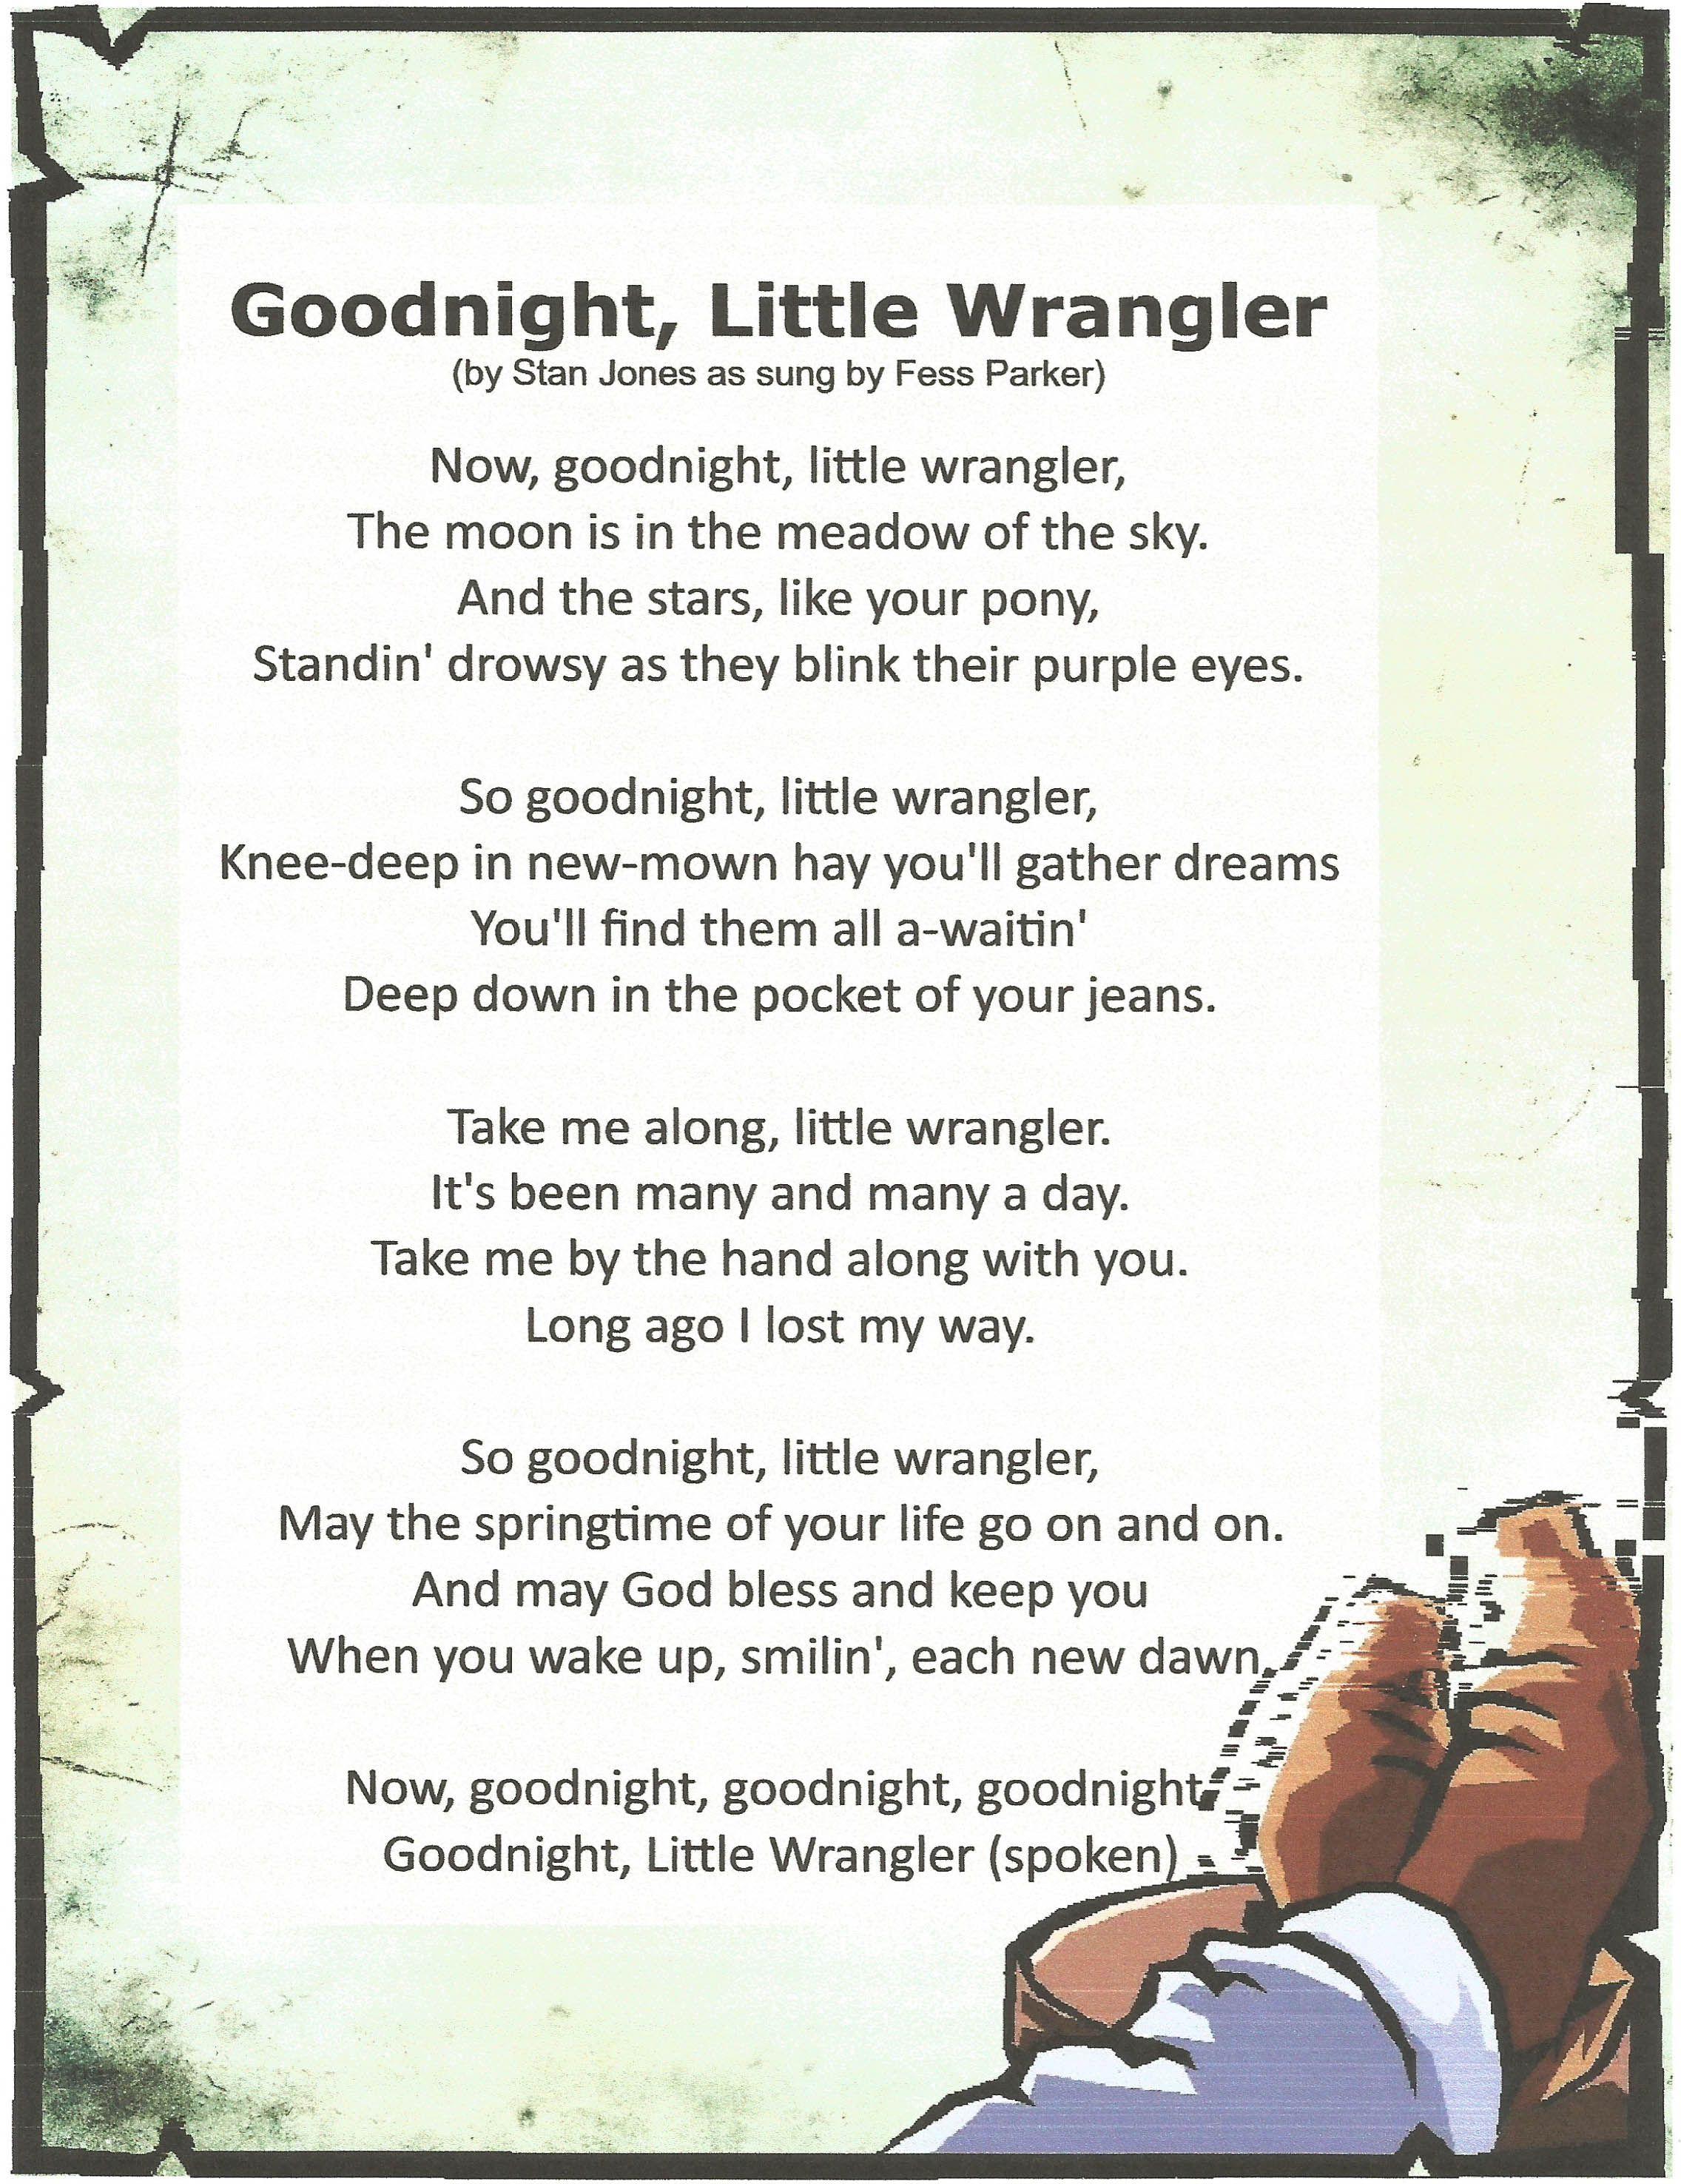 Goodnight Little Wrangler By Stan Jones As Sung By Fess Parker